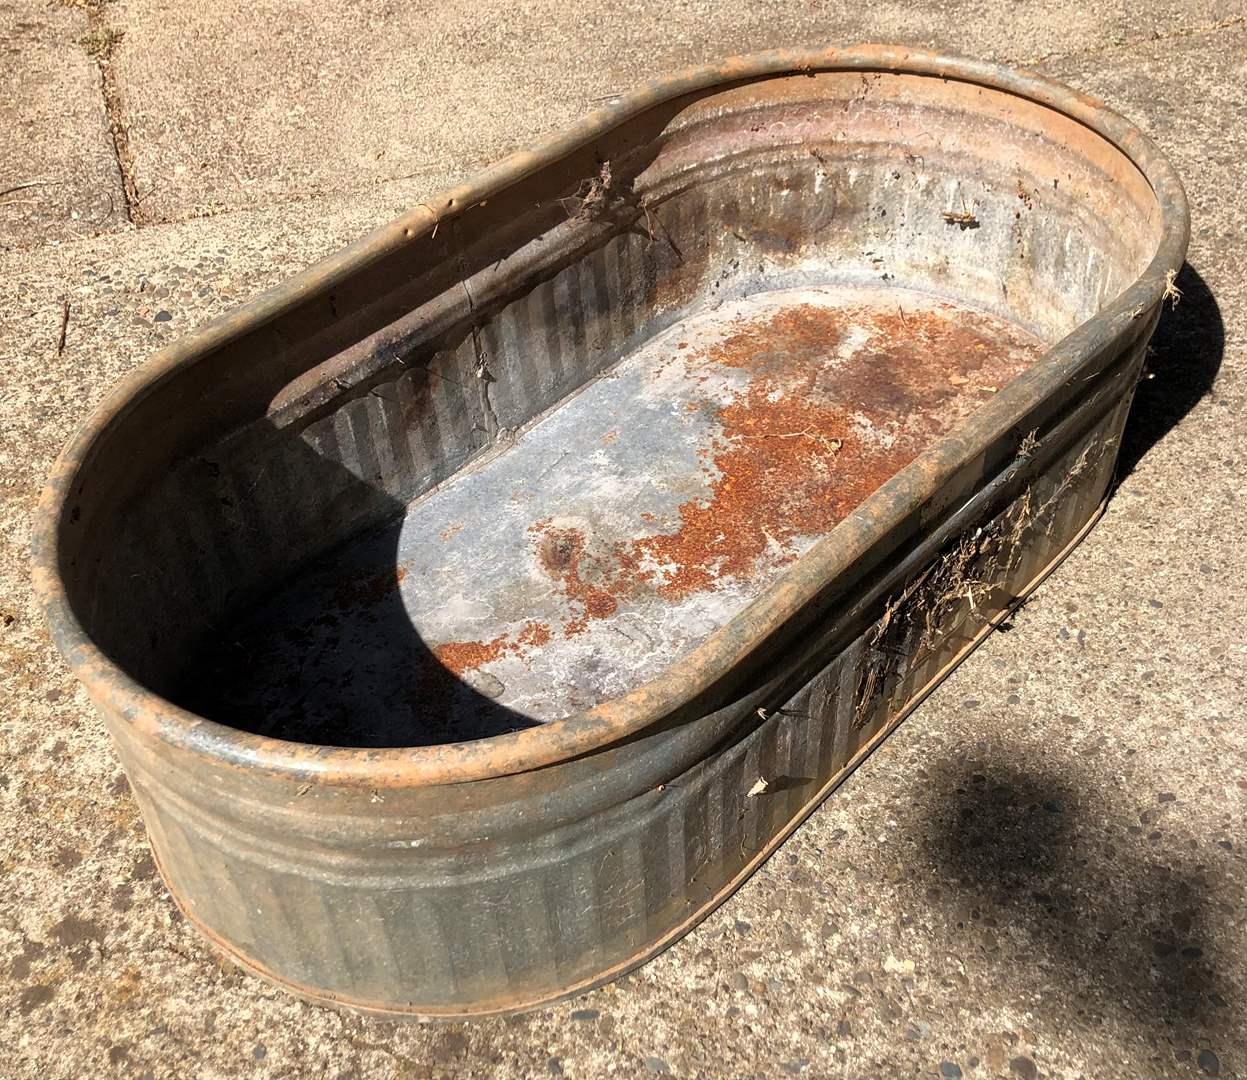 Lot # 56 - Behlen Country Galvanized Stock Tank (main image)